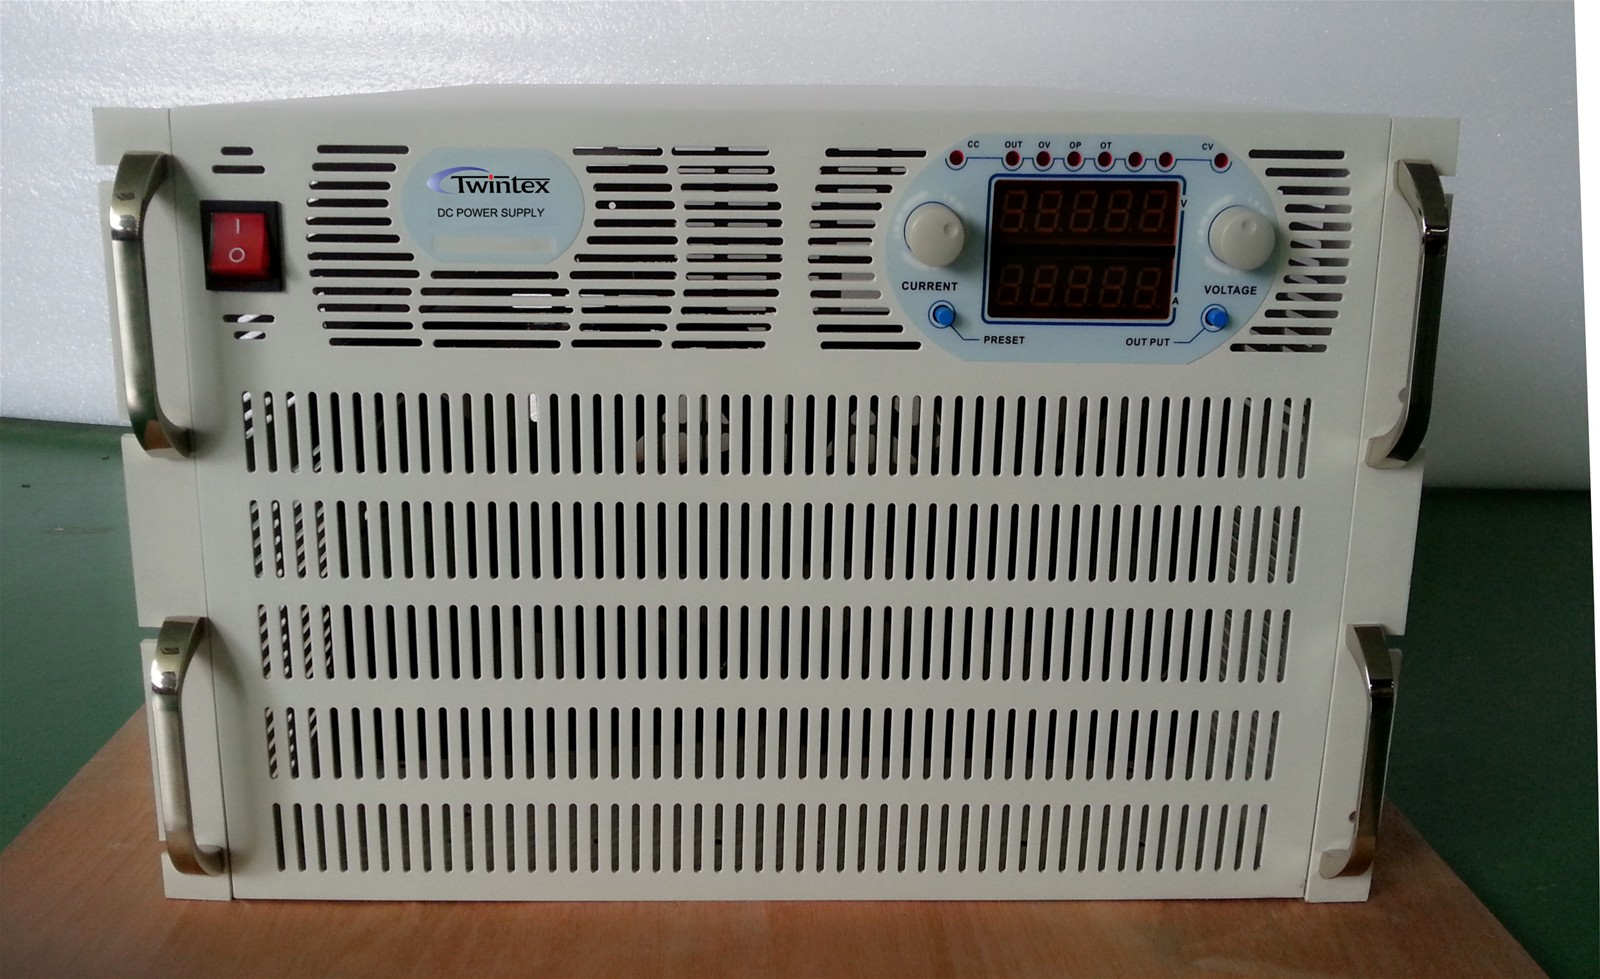 Programmable High Power Dc Supply 15v800a 50v250a 100v100a Current 250v40a 400v 300a 1000v10a